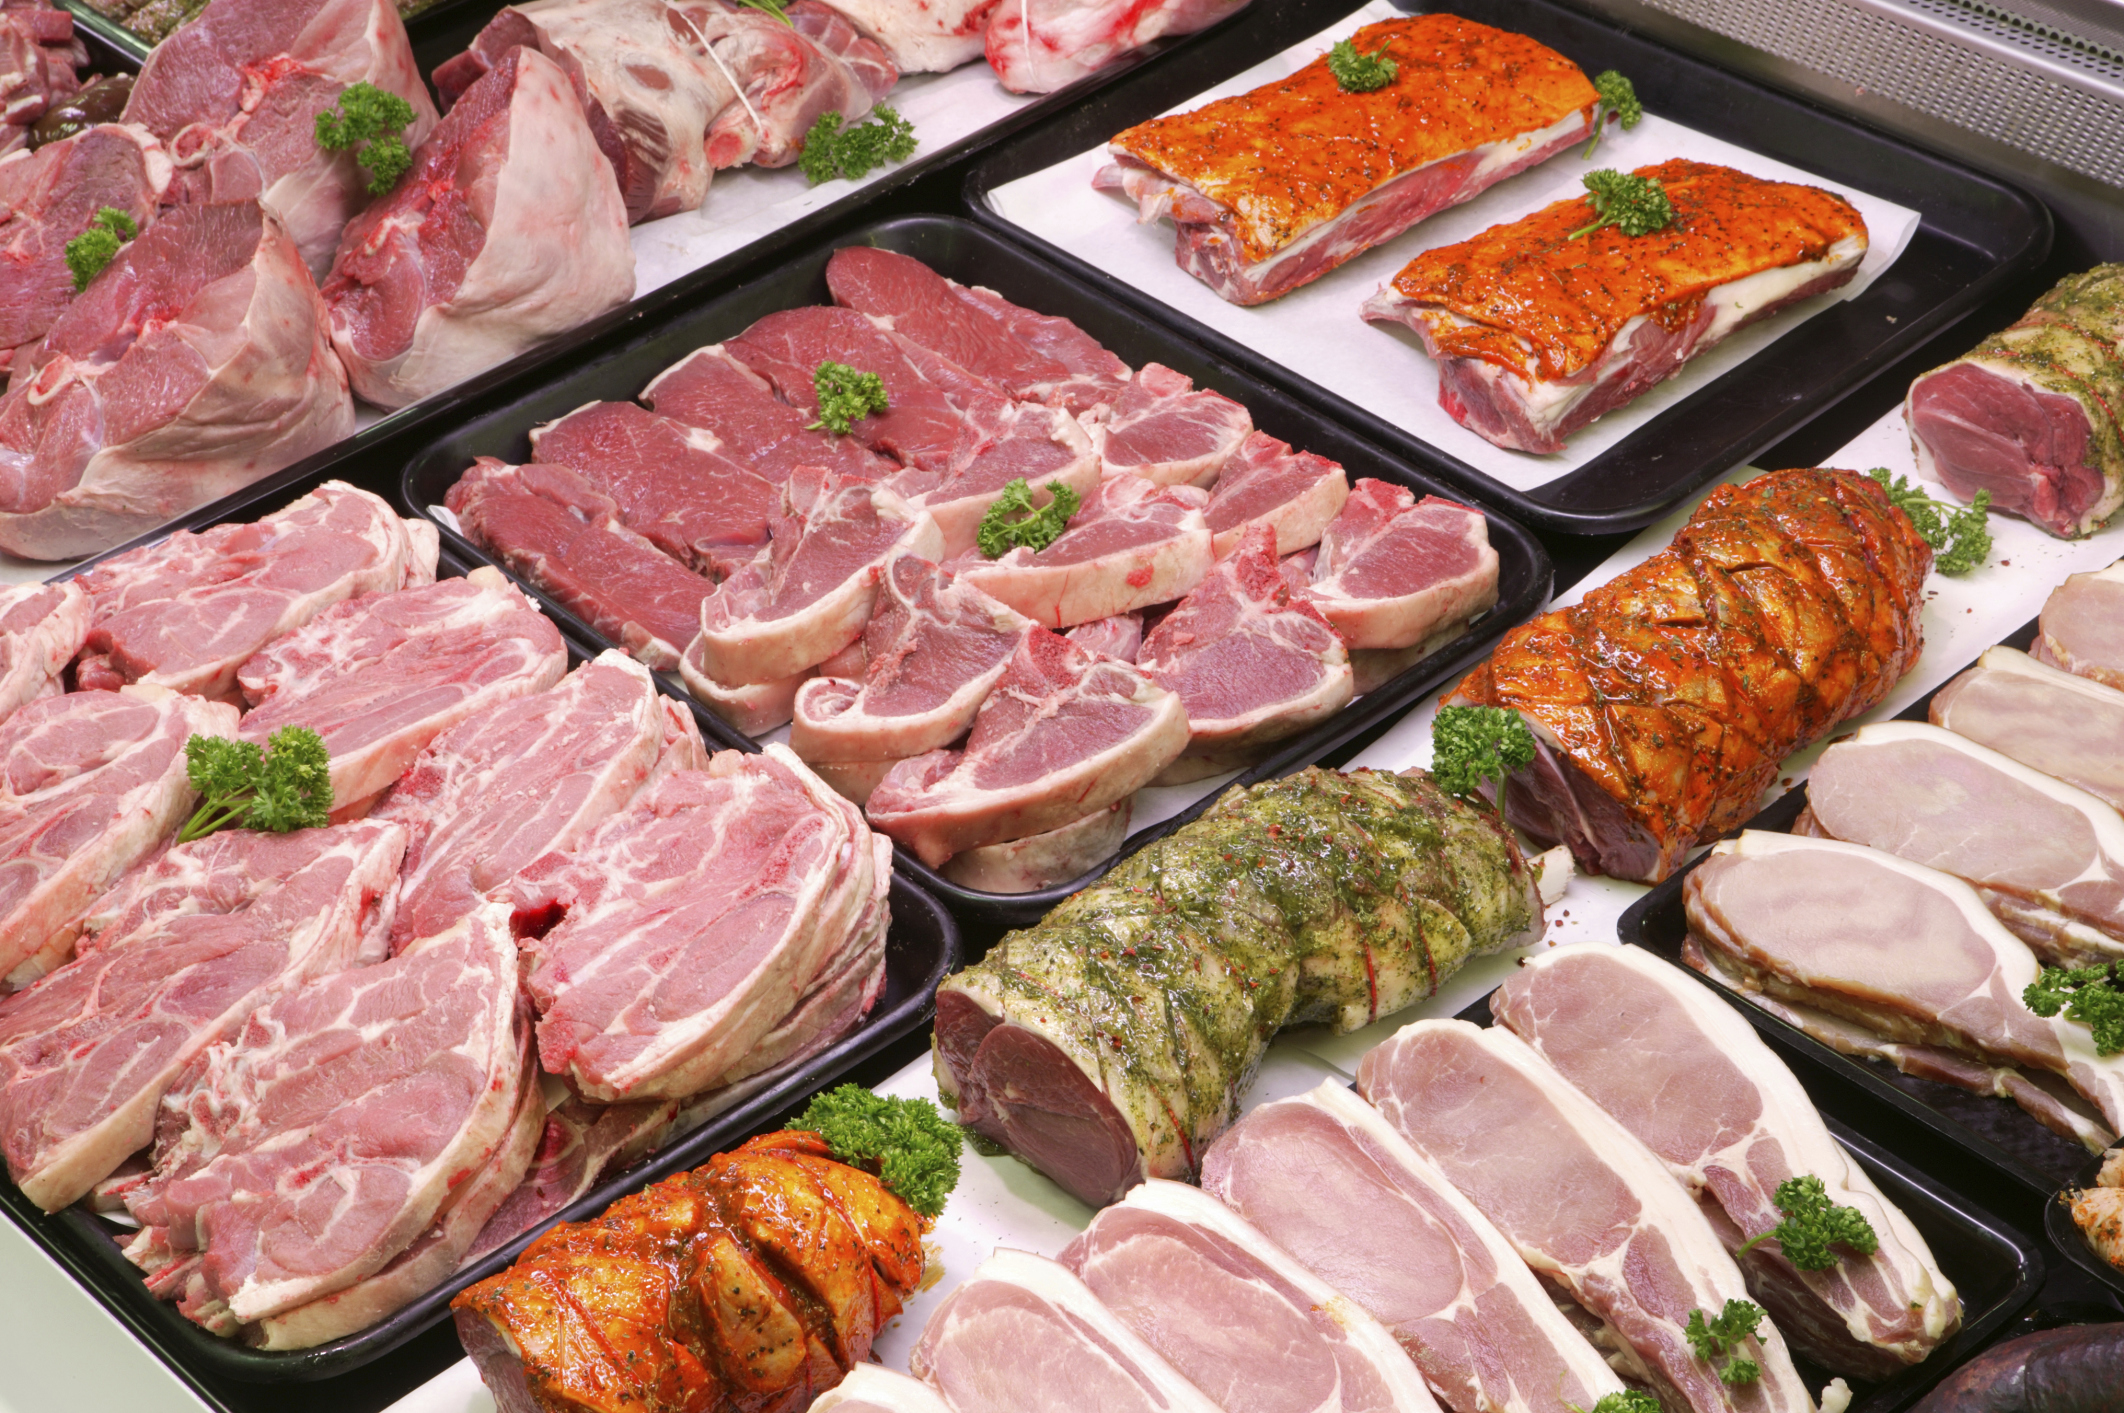 meat shop business plan pdf